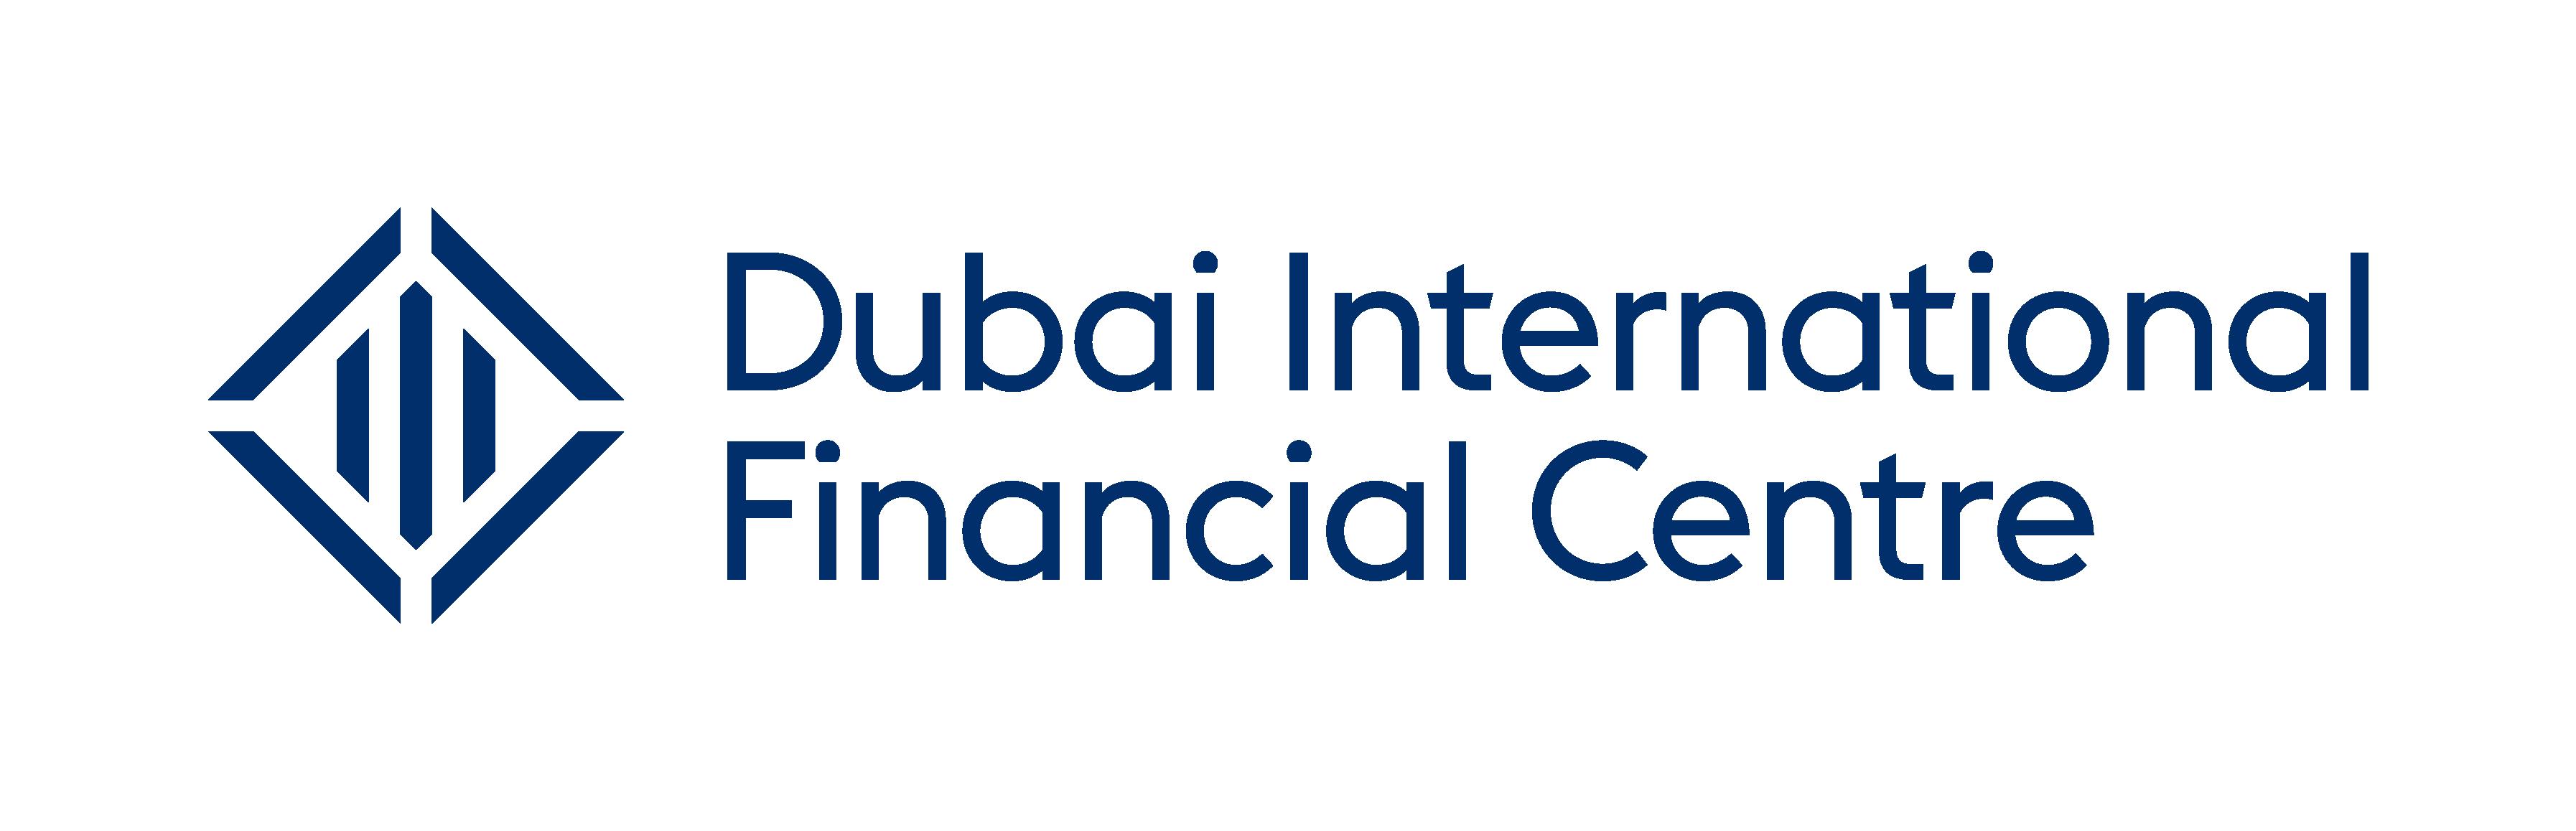 Dubai International Financial Centre - Wikipedia